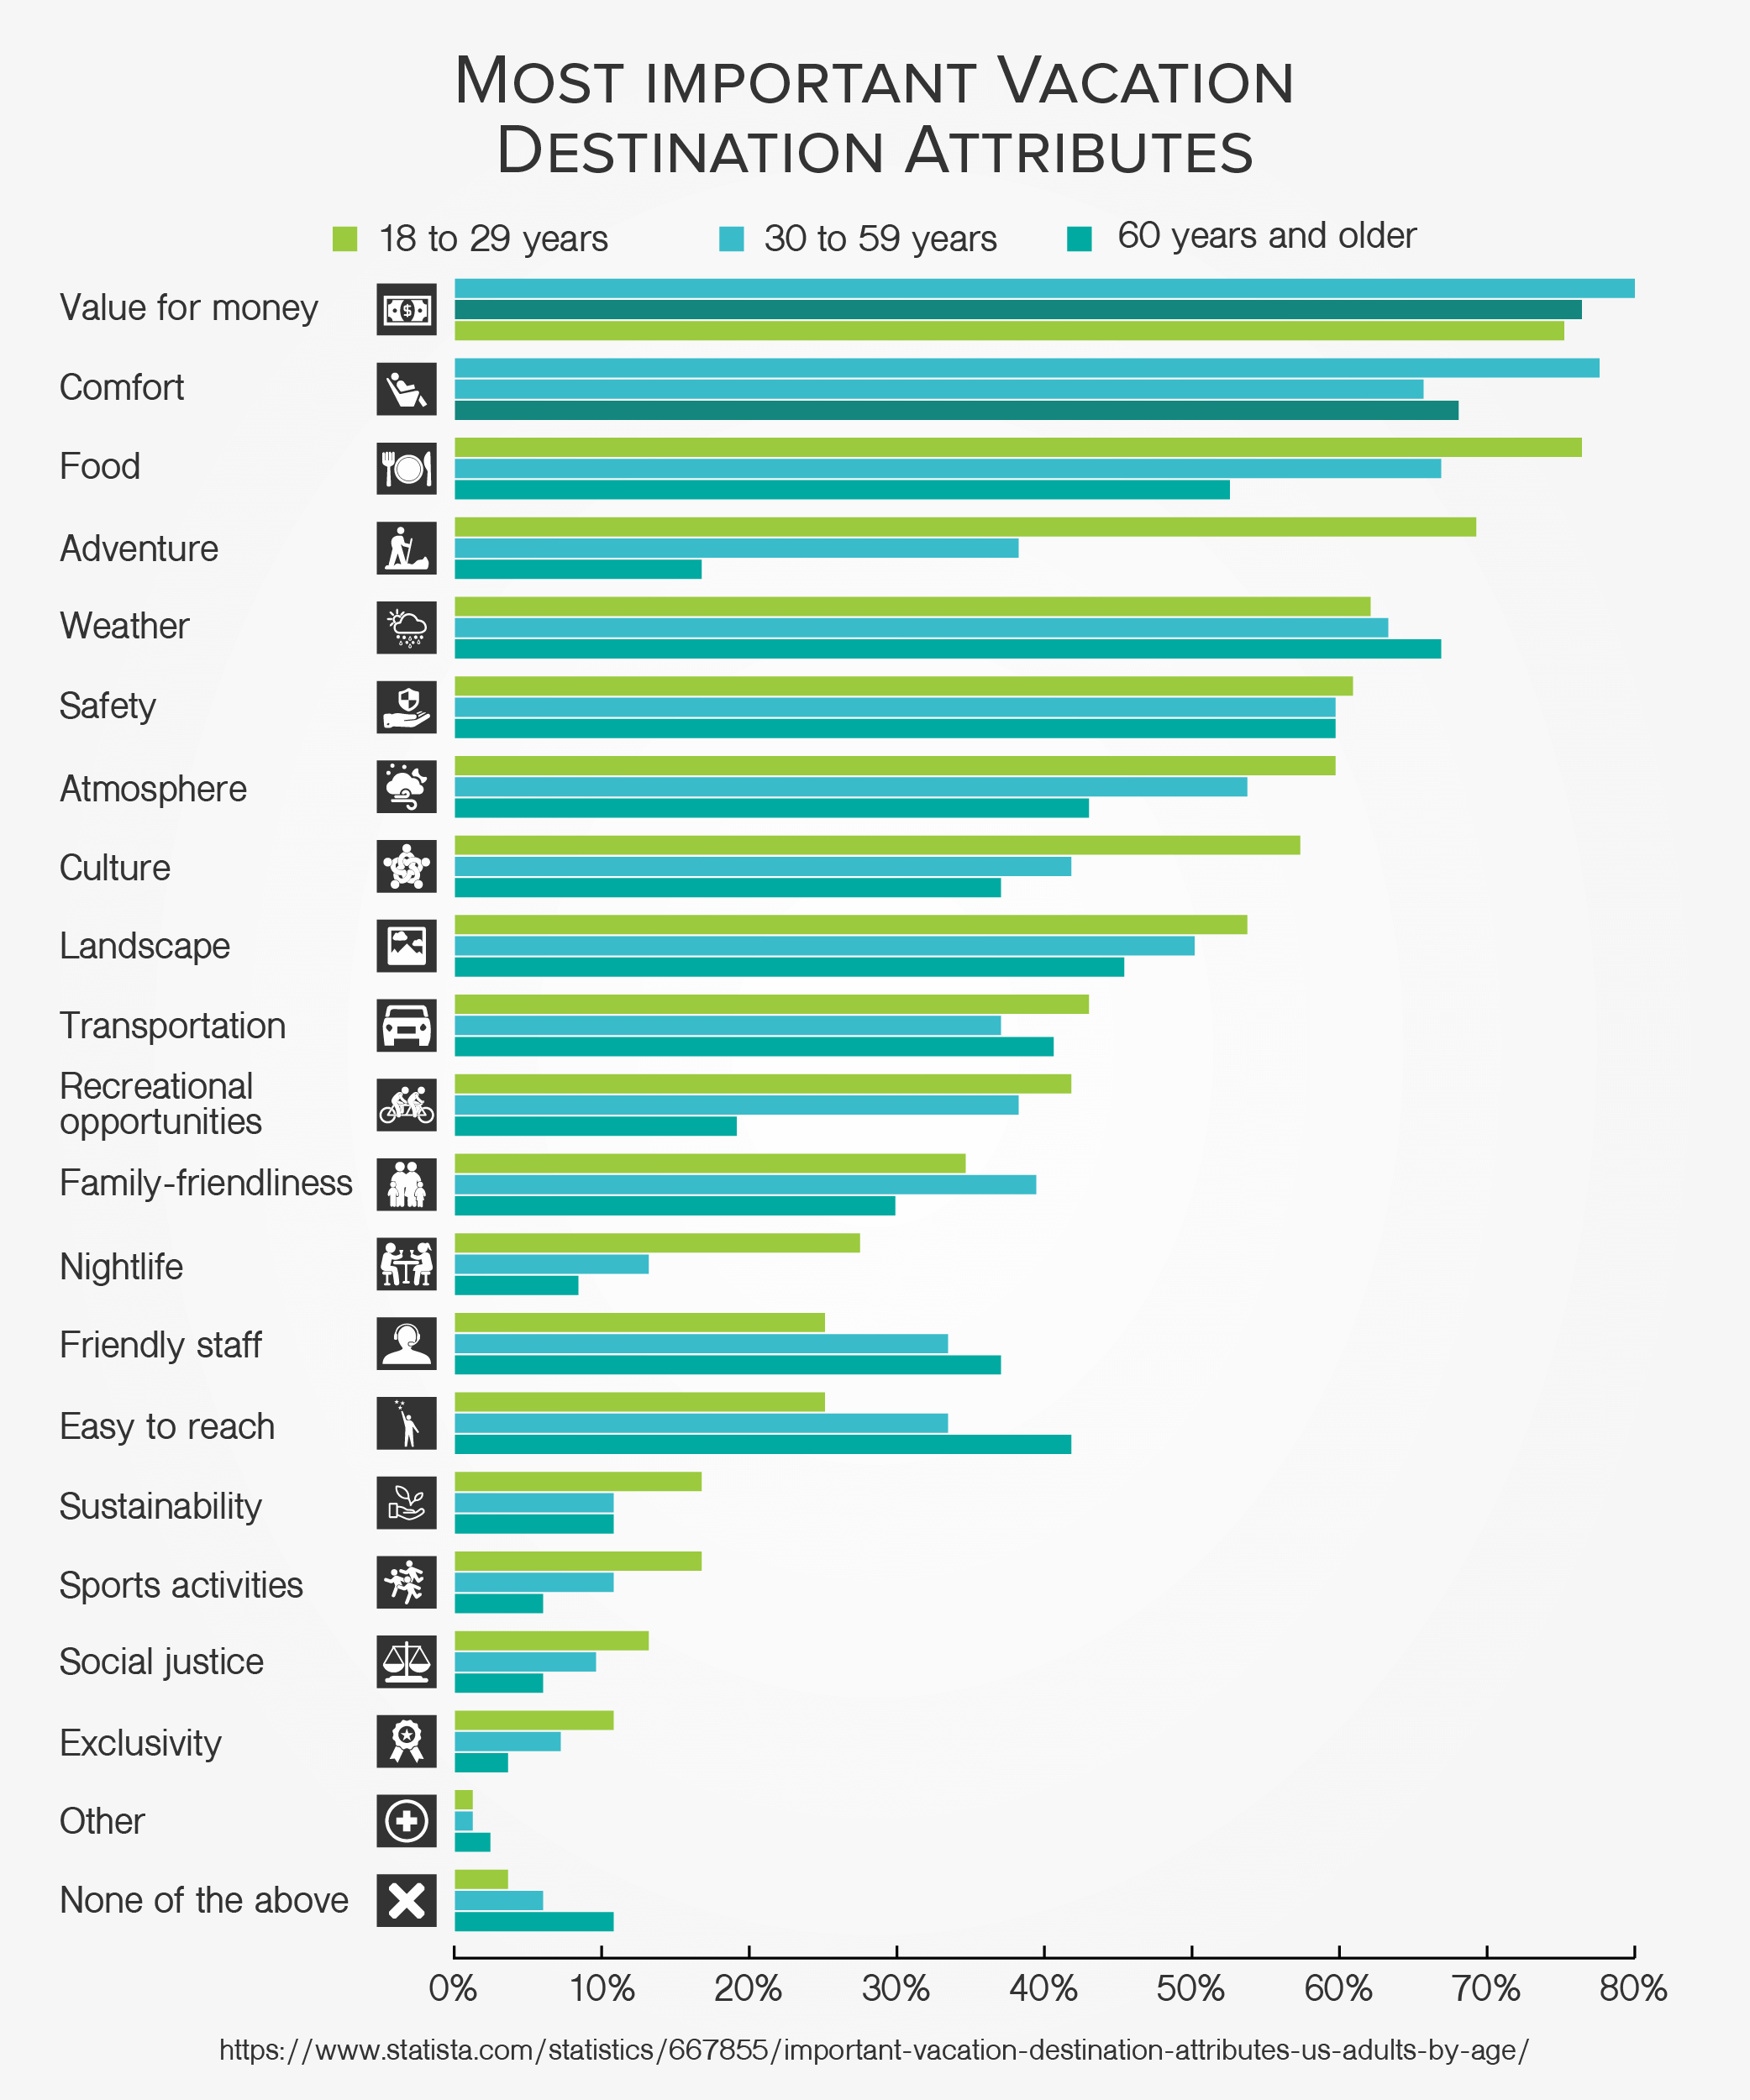 Most important Vacation Destination Attributes (2017)